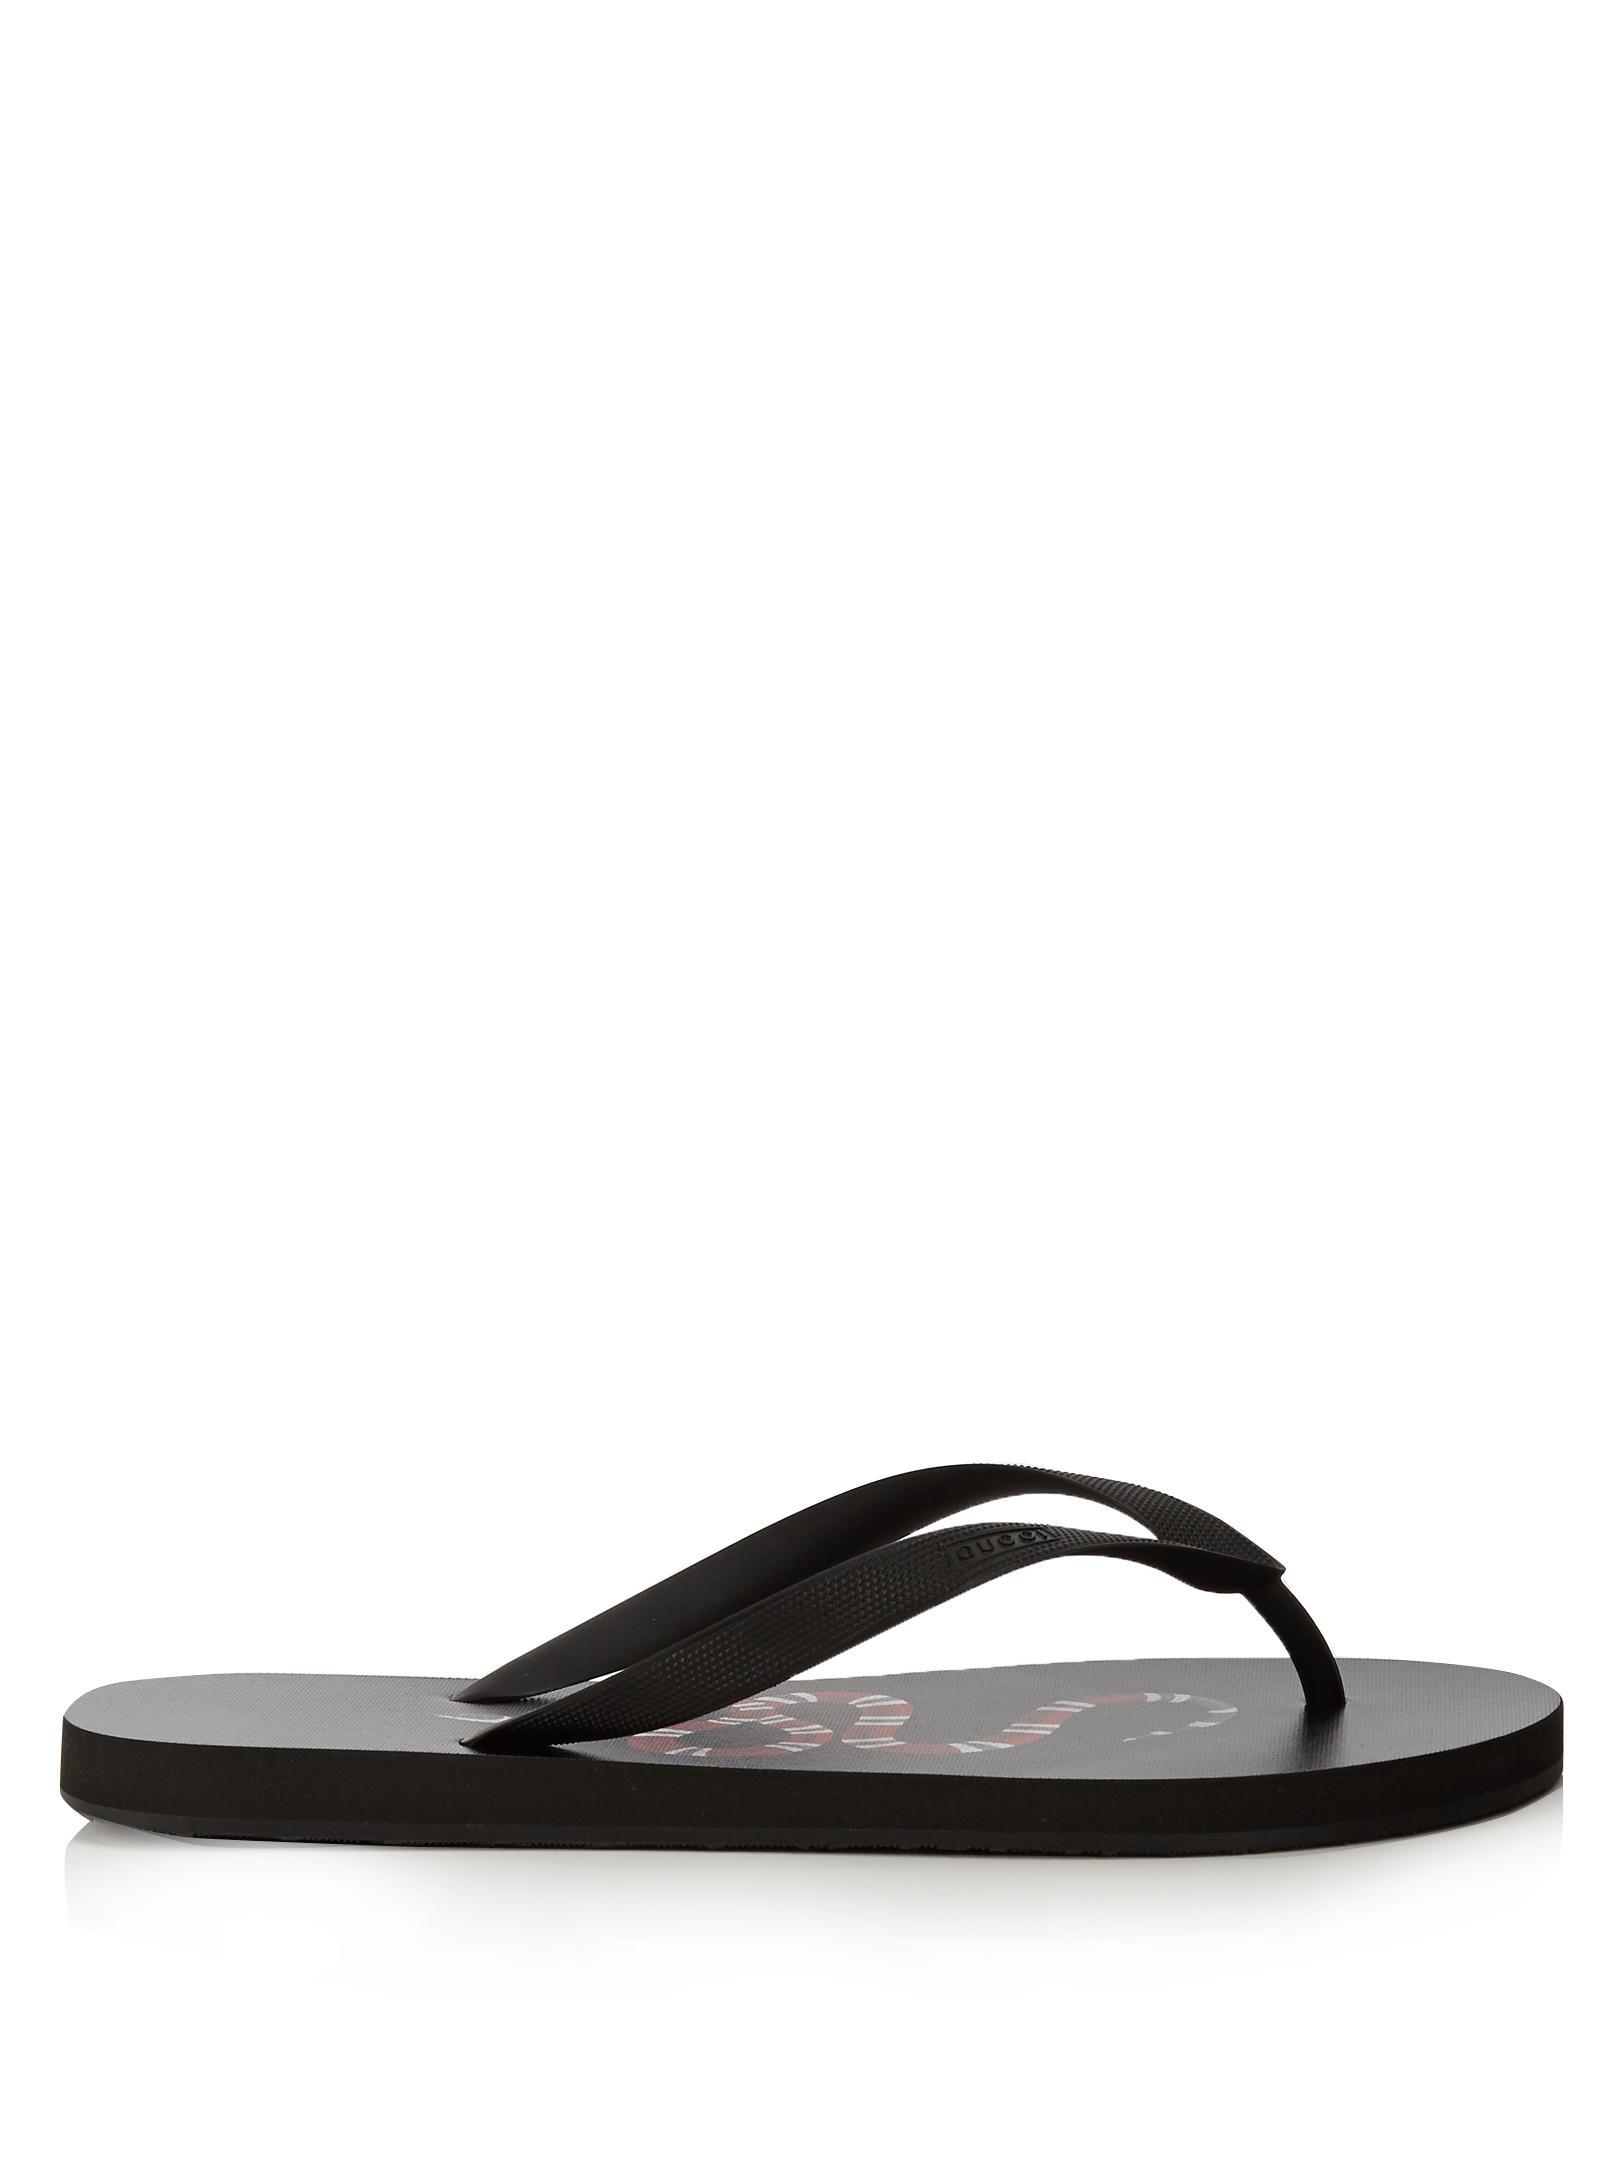 Lyst - Gucci Snake-print Flip Flops in Black for Men 08b30d0fb